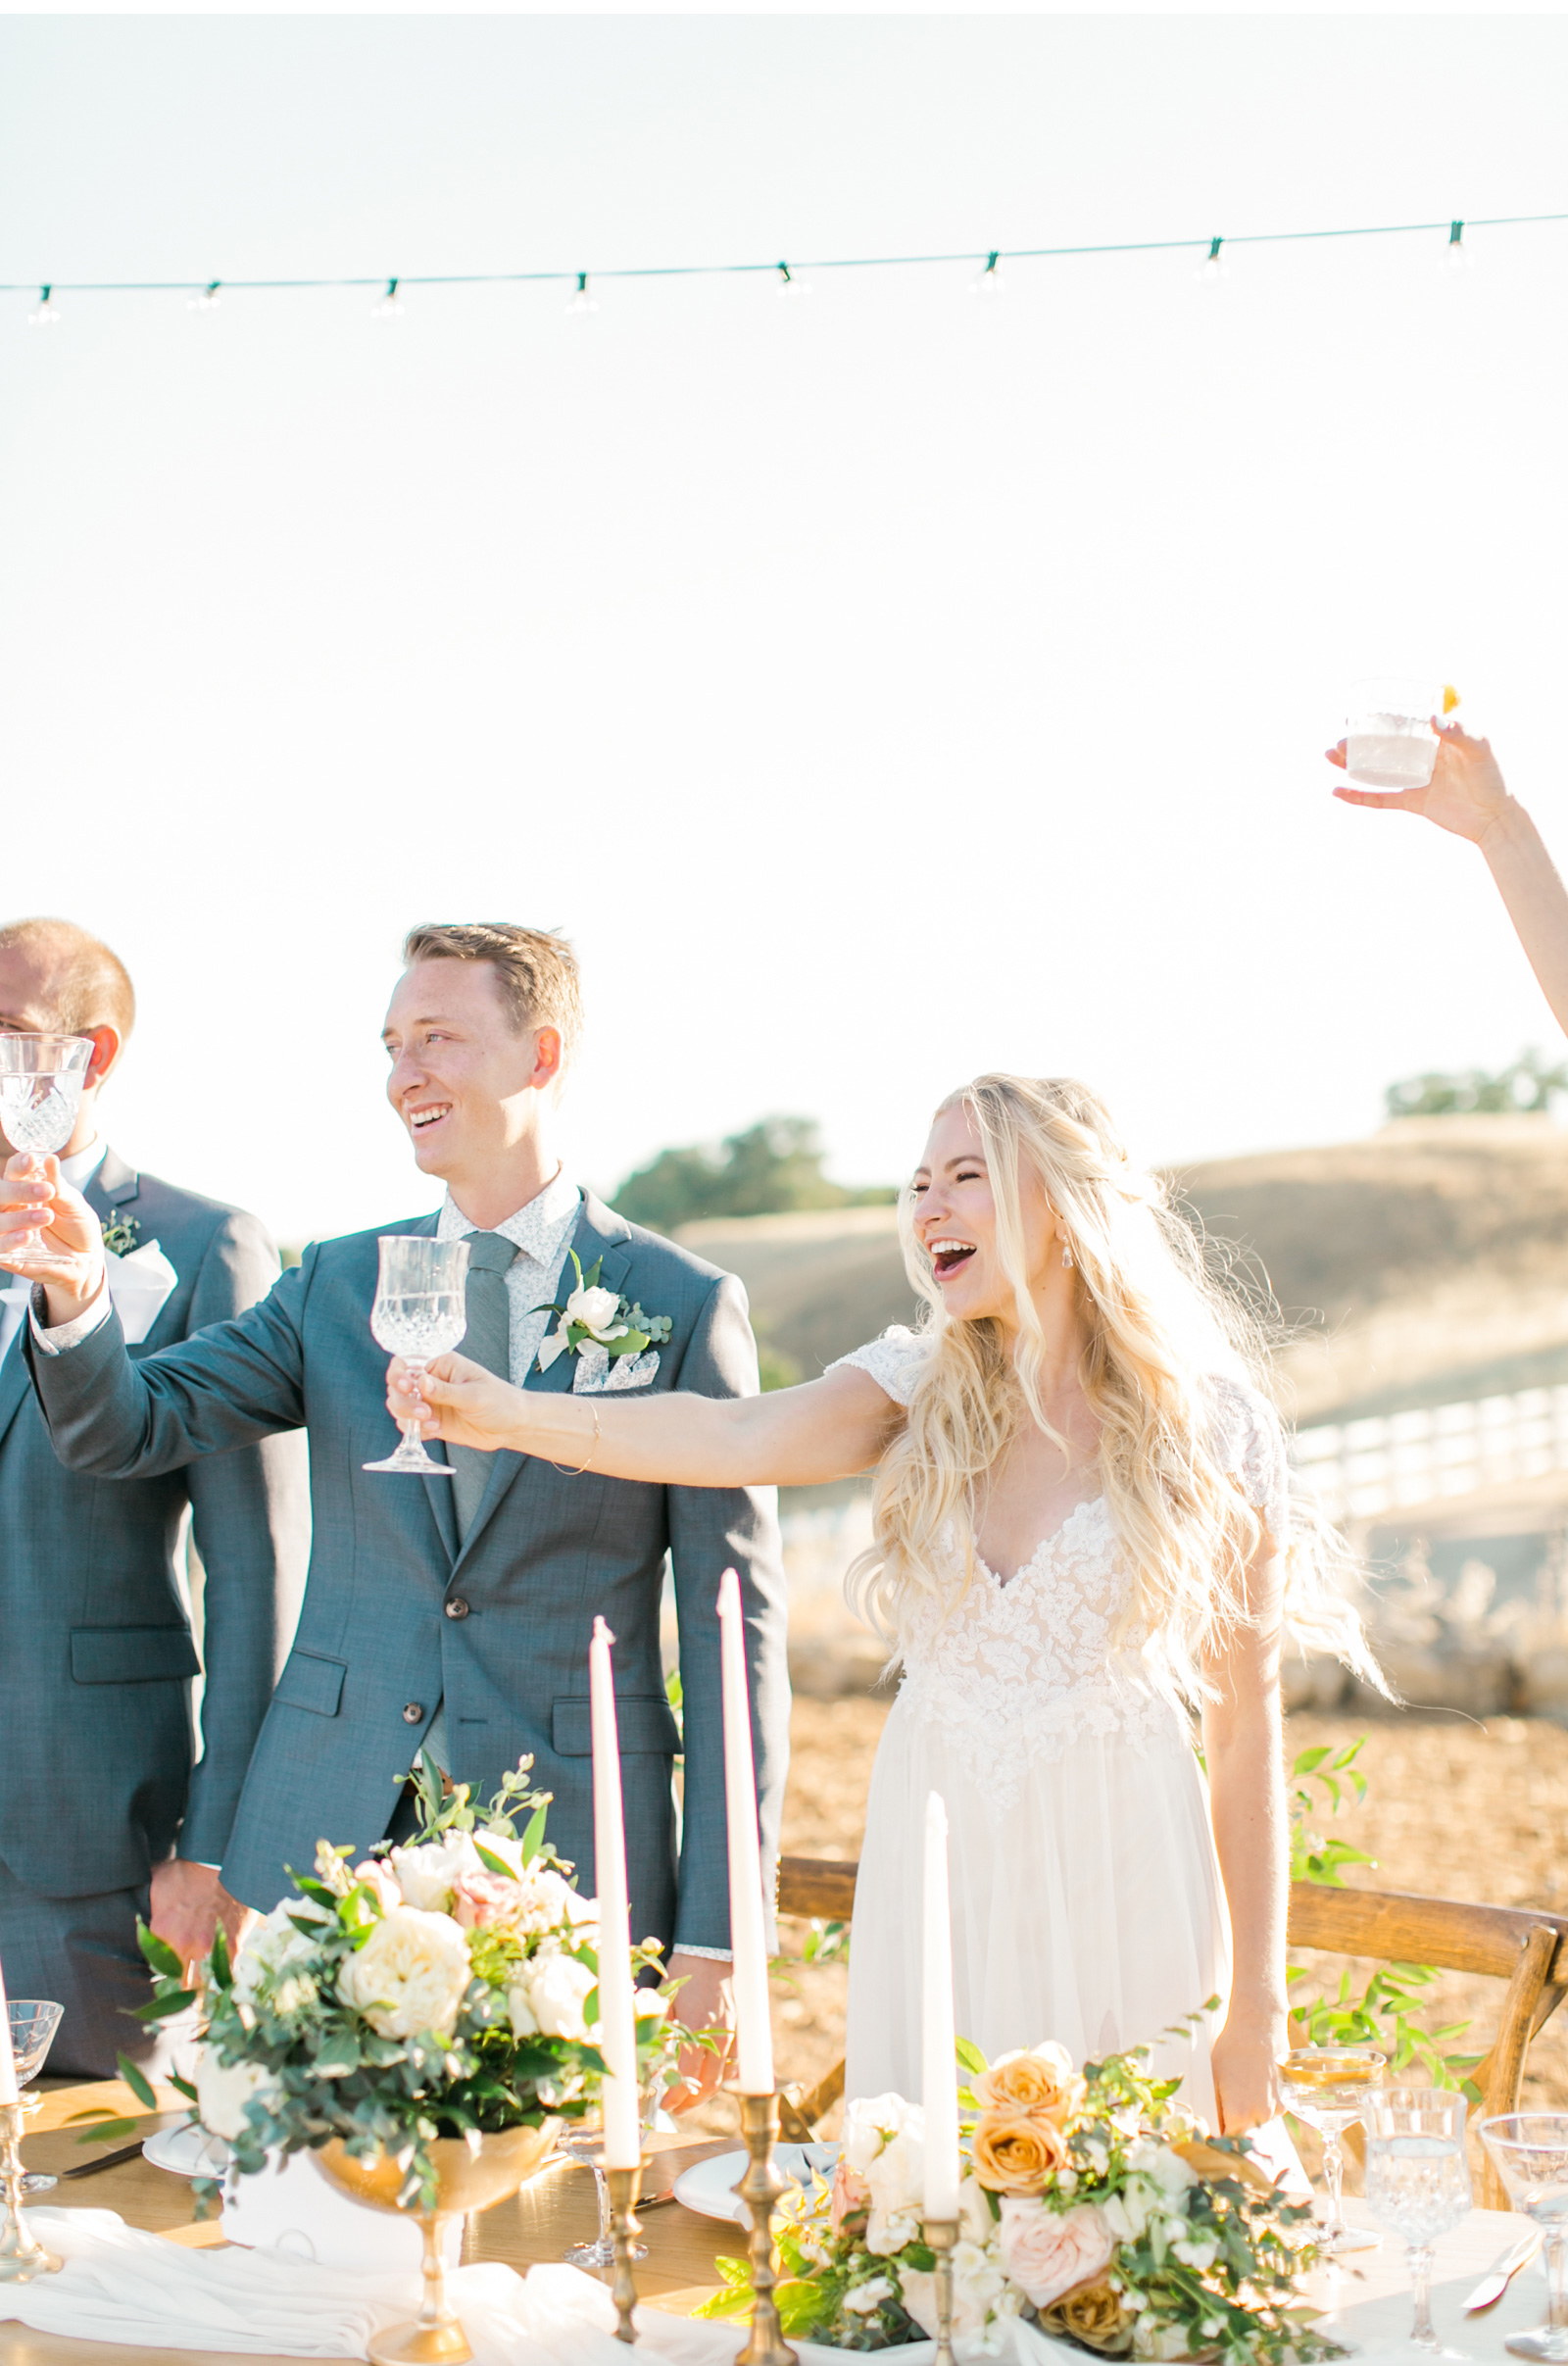 Natalie-Schutt-Photography's-Wedding-Style-Me-Pretty-Paso-Robles_11.jpg